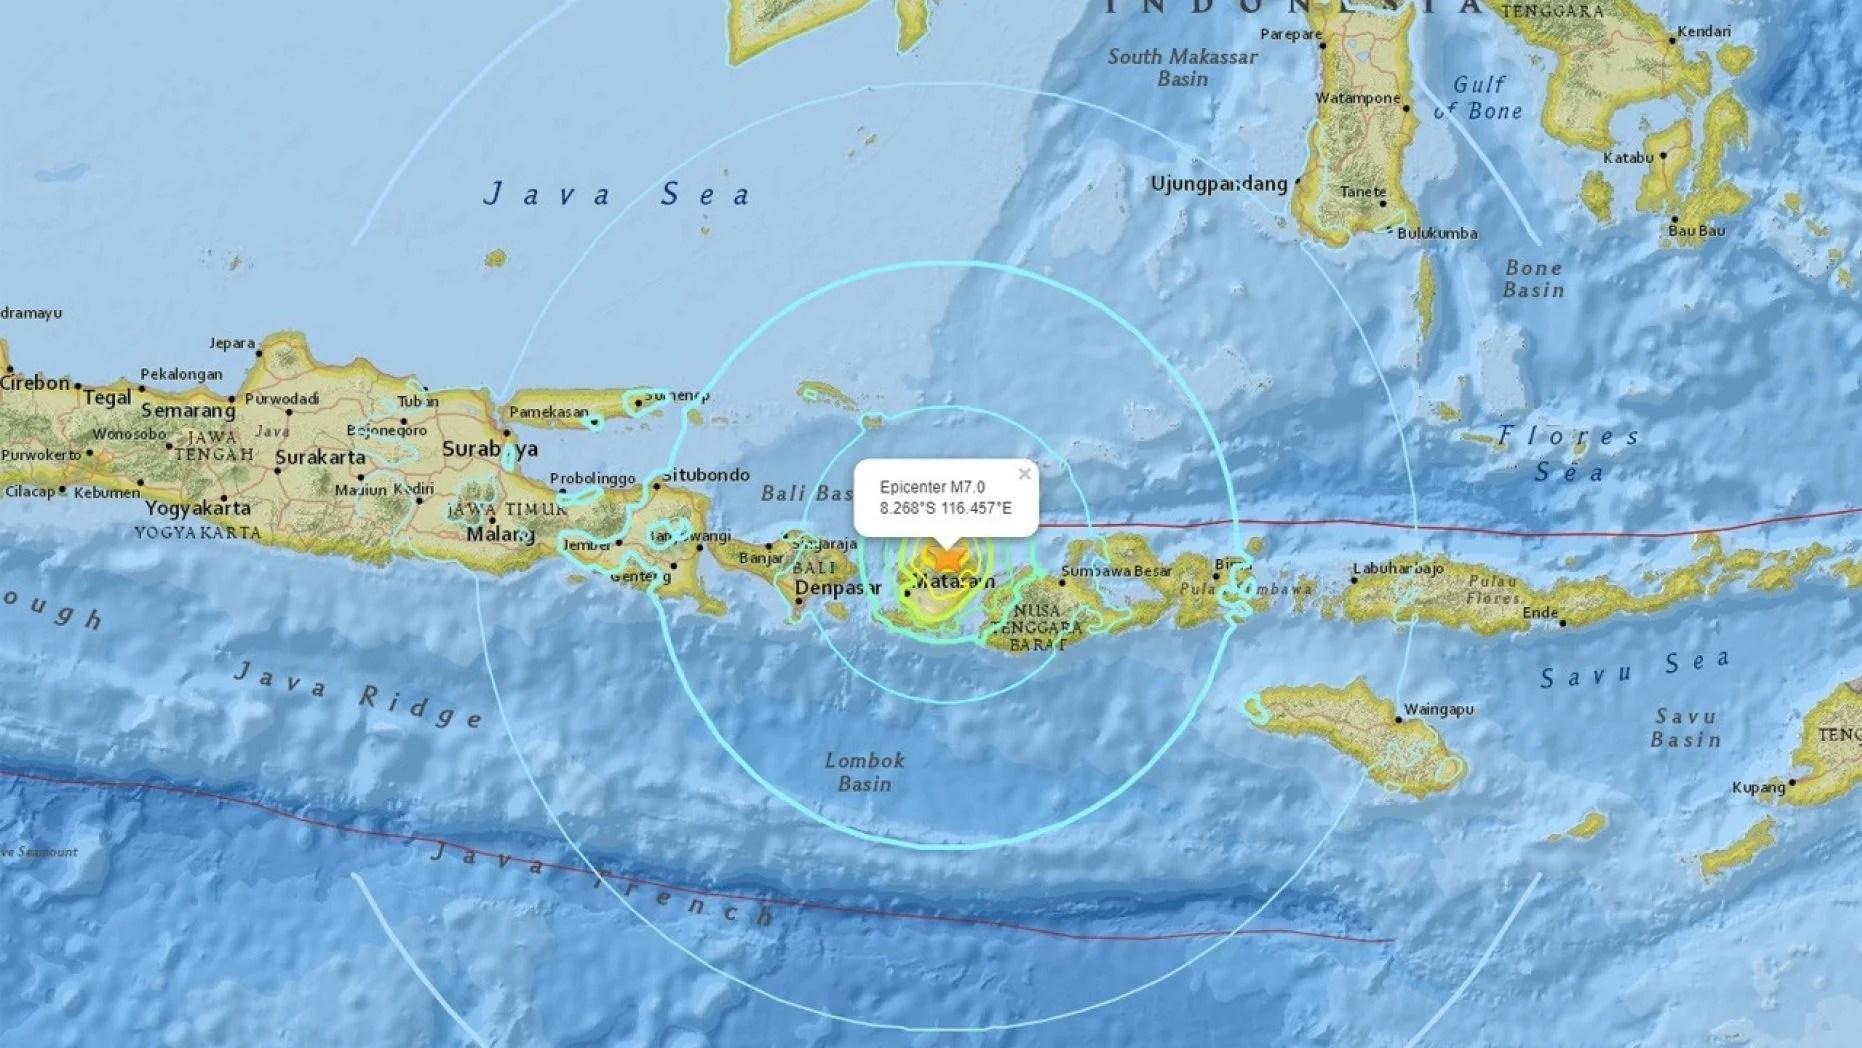 Bali Rocked by 7.0 Earthquake, Tsunami Warnings Issued